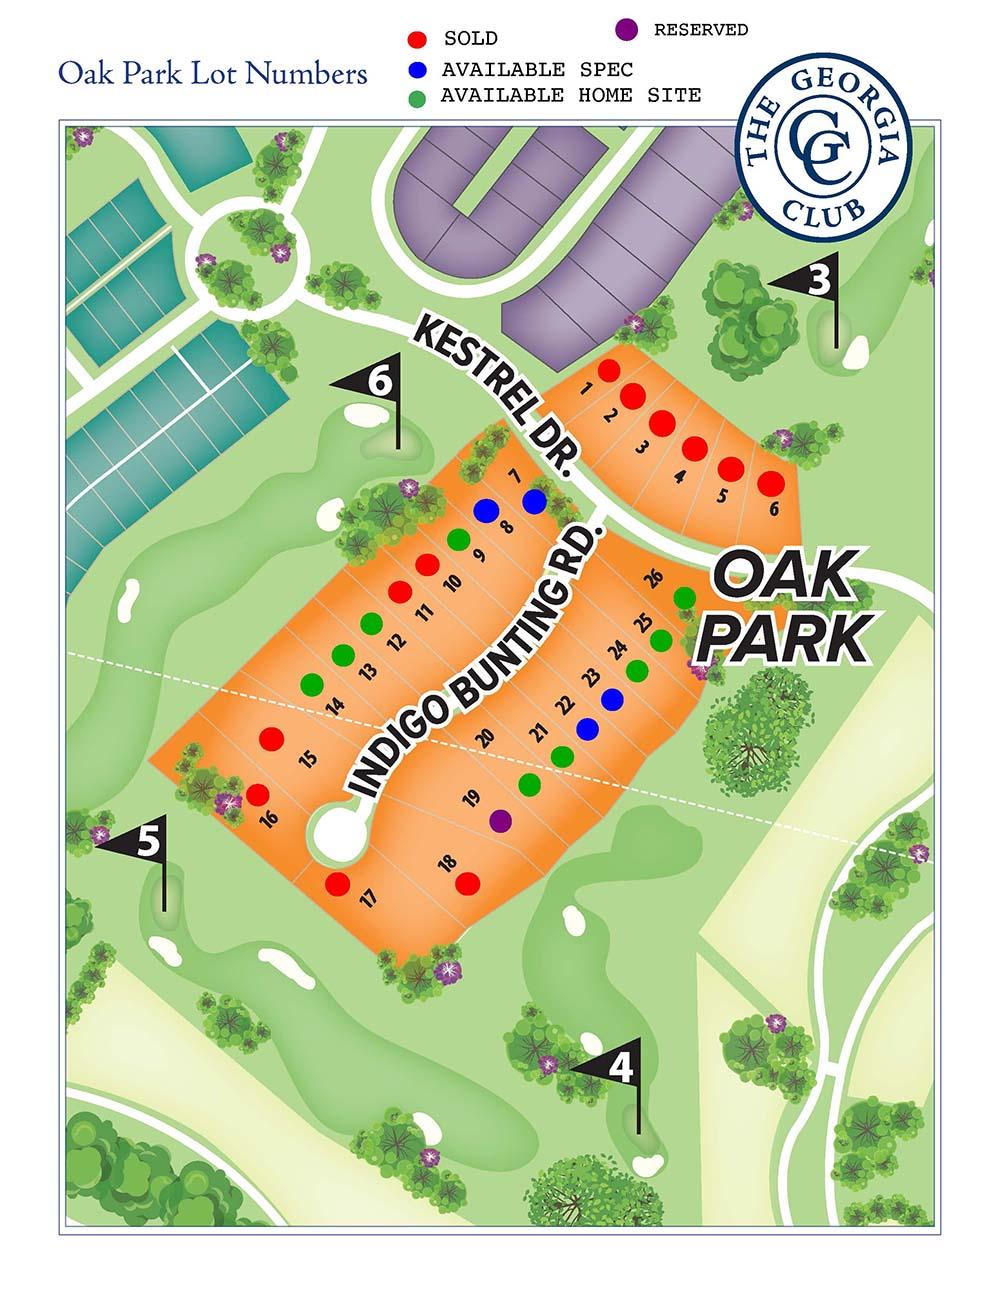 Oak Park lot info